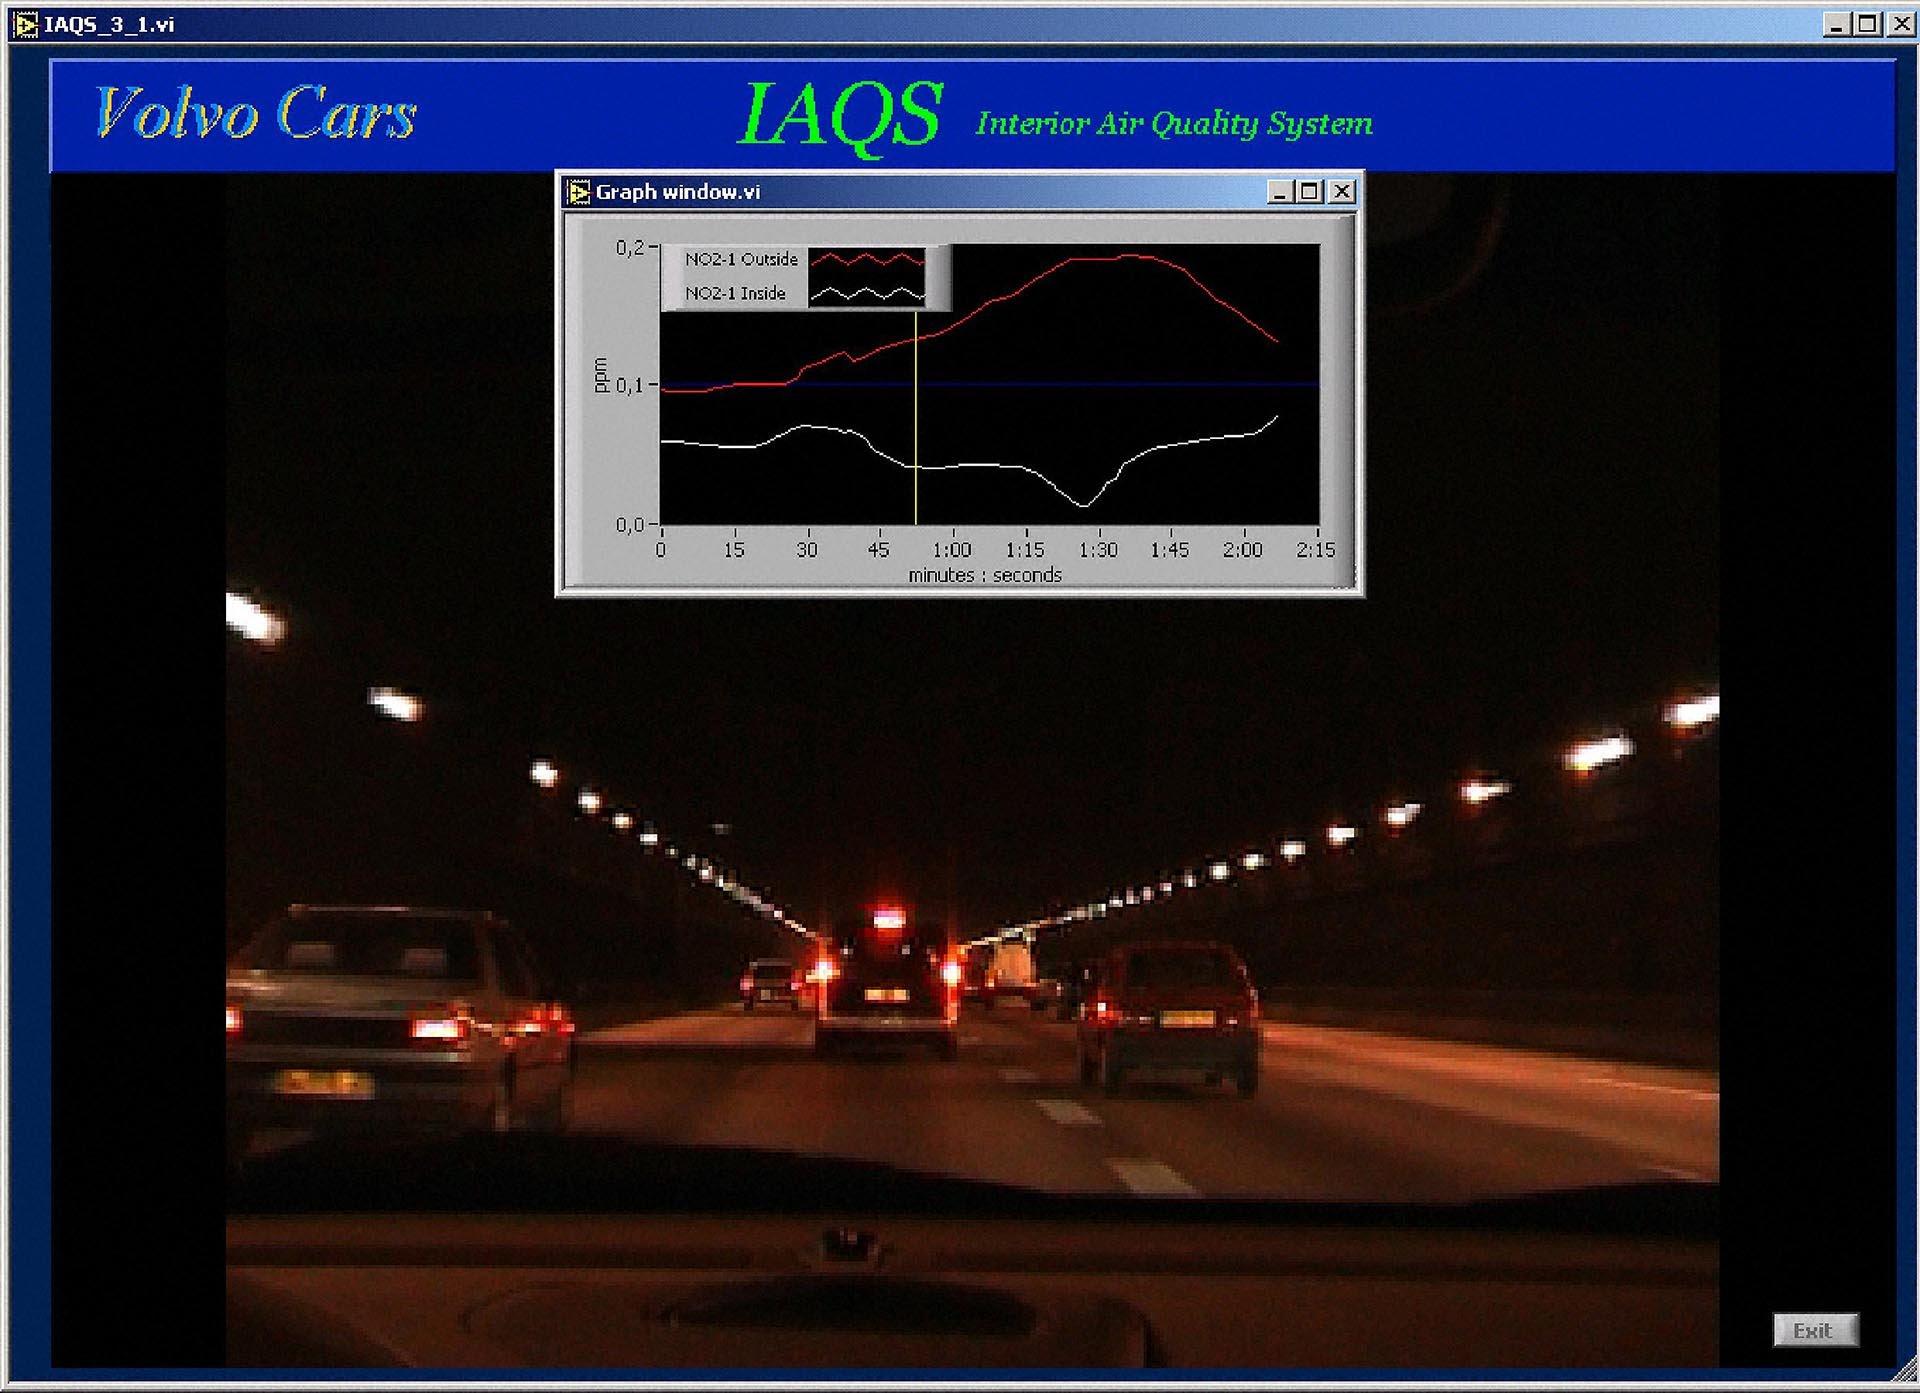 Volvo IAQS_Interior_Air_Quality_System